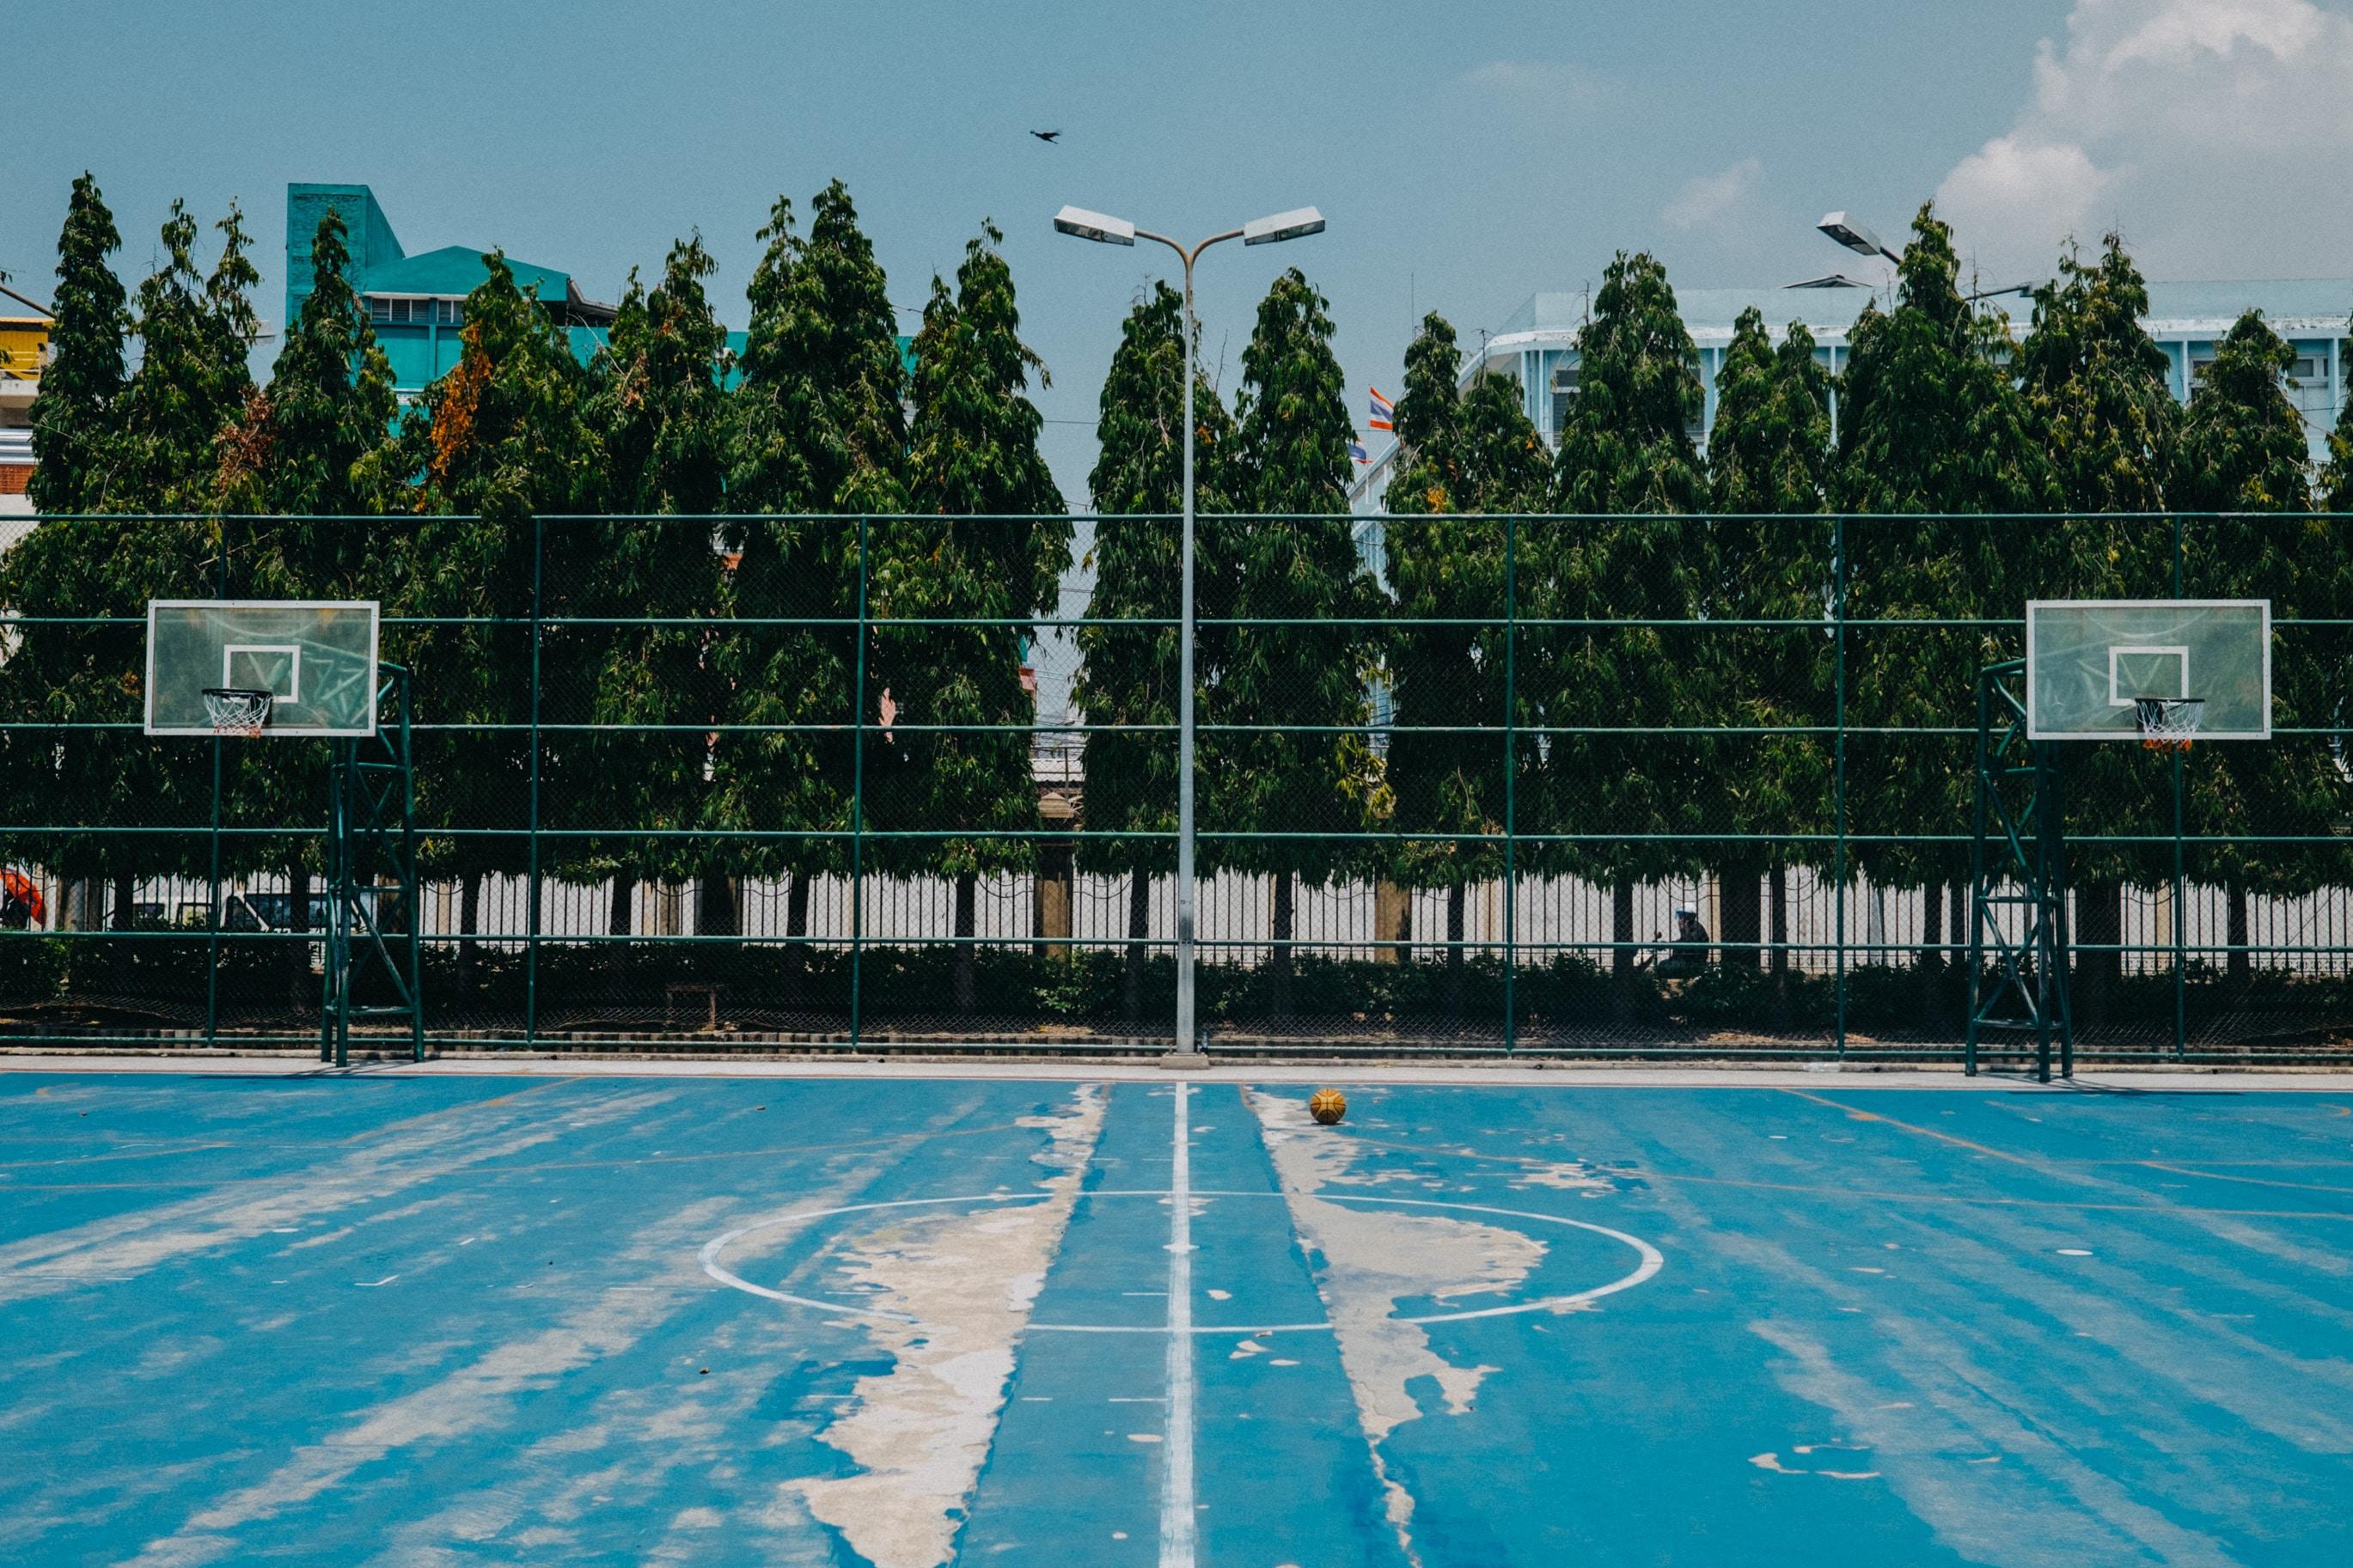 landscape photo of basketball court